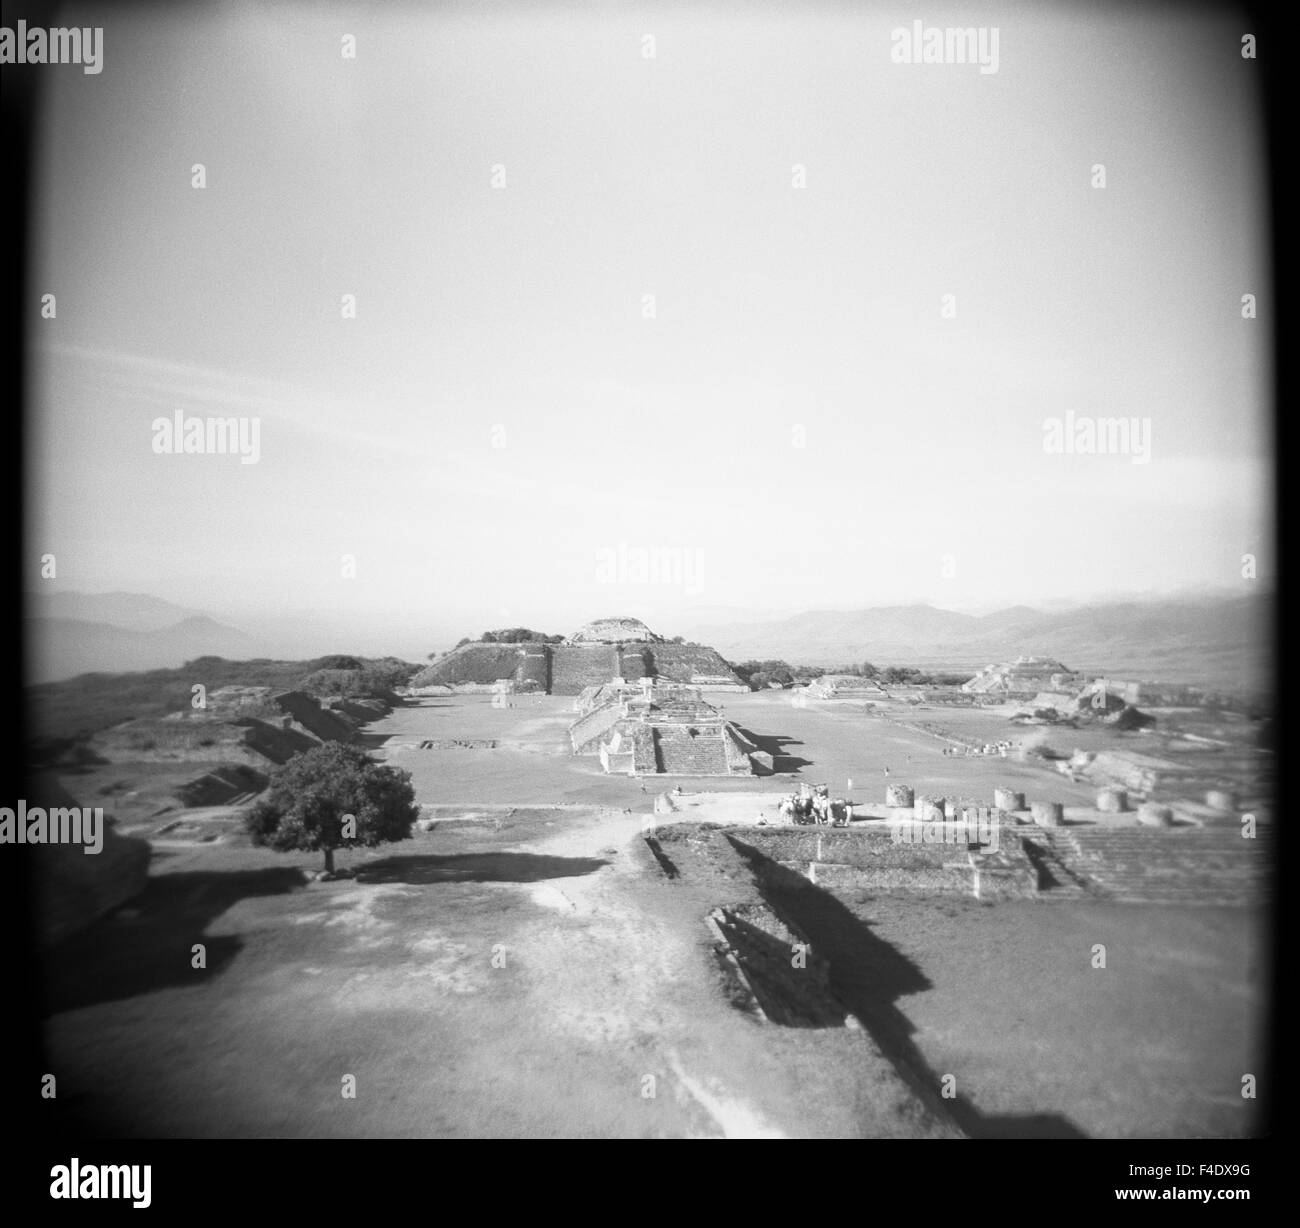 Stone ruins at Monte Alban. Oaxaca,Mexico - Stock Image